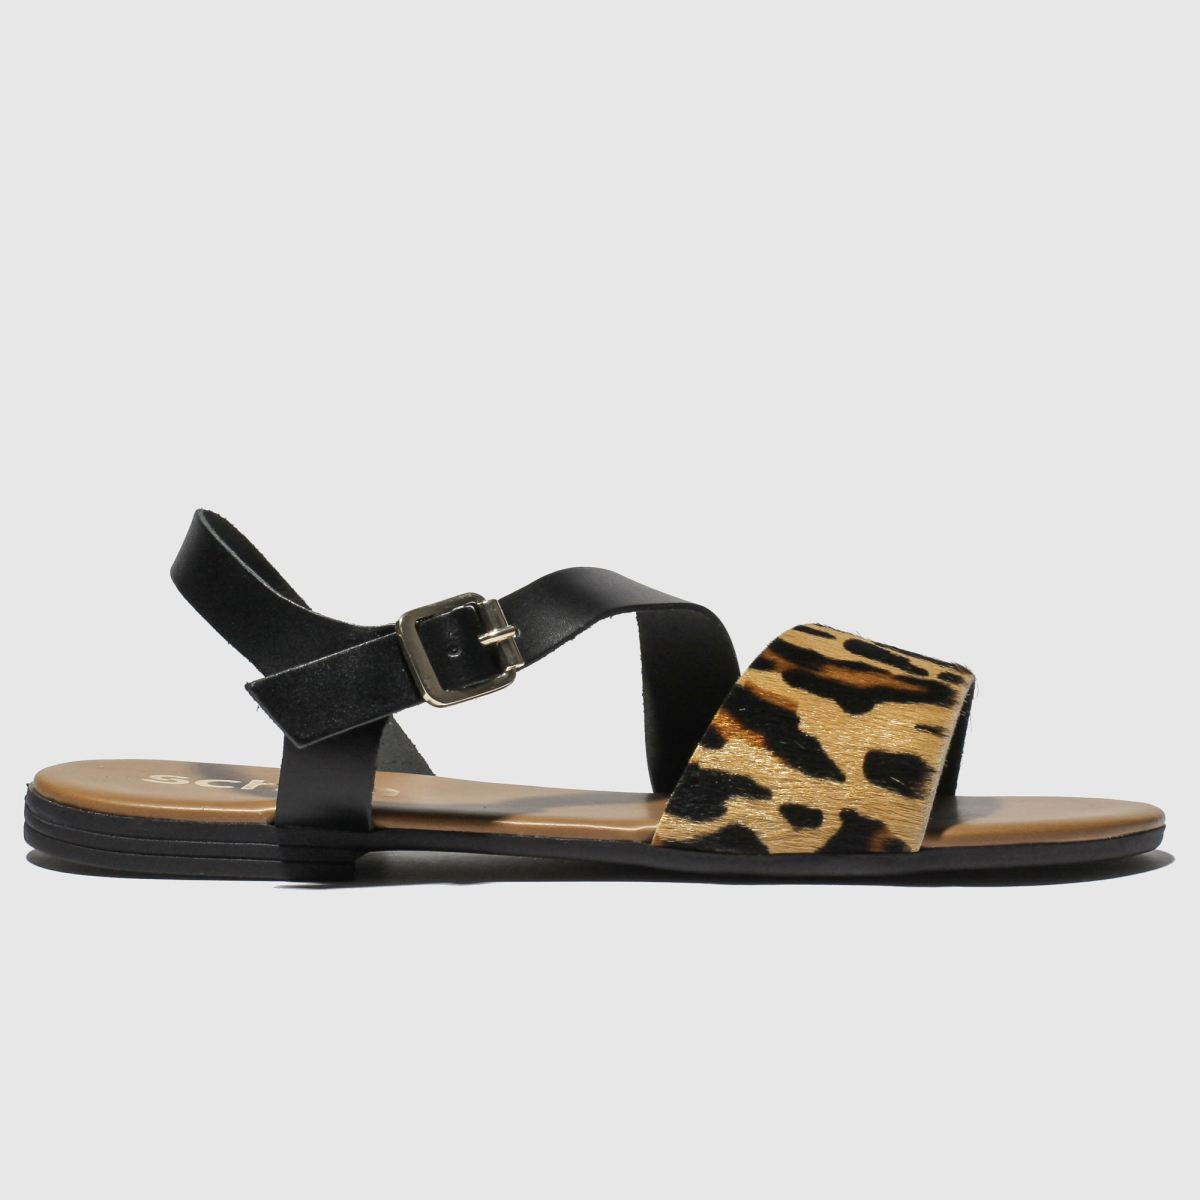 Schuh Black & Brown Venice Sandals